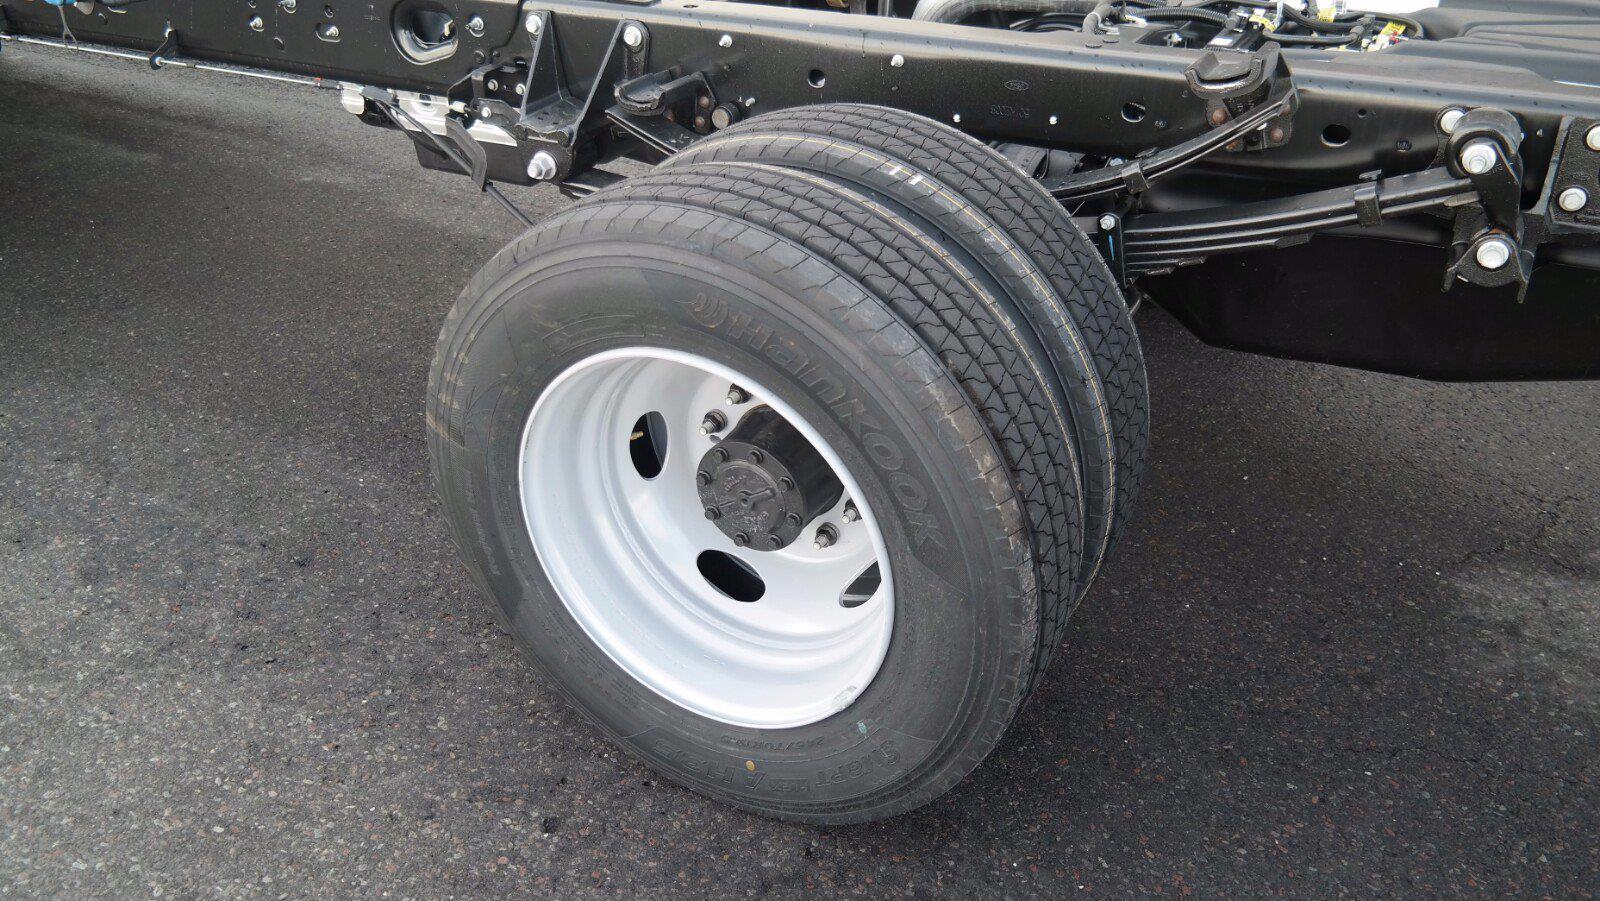 2021 Ford F-600 Regular Cab DRW 4x4, Cab Chassis #FLU10124 - photo 10